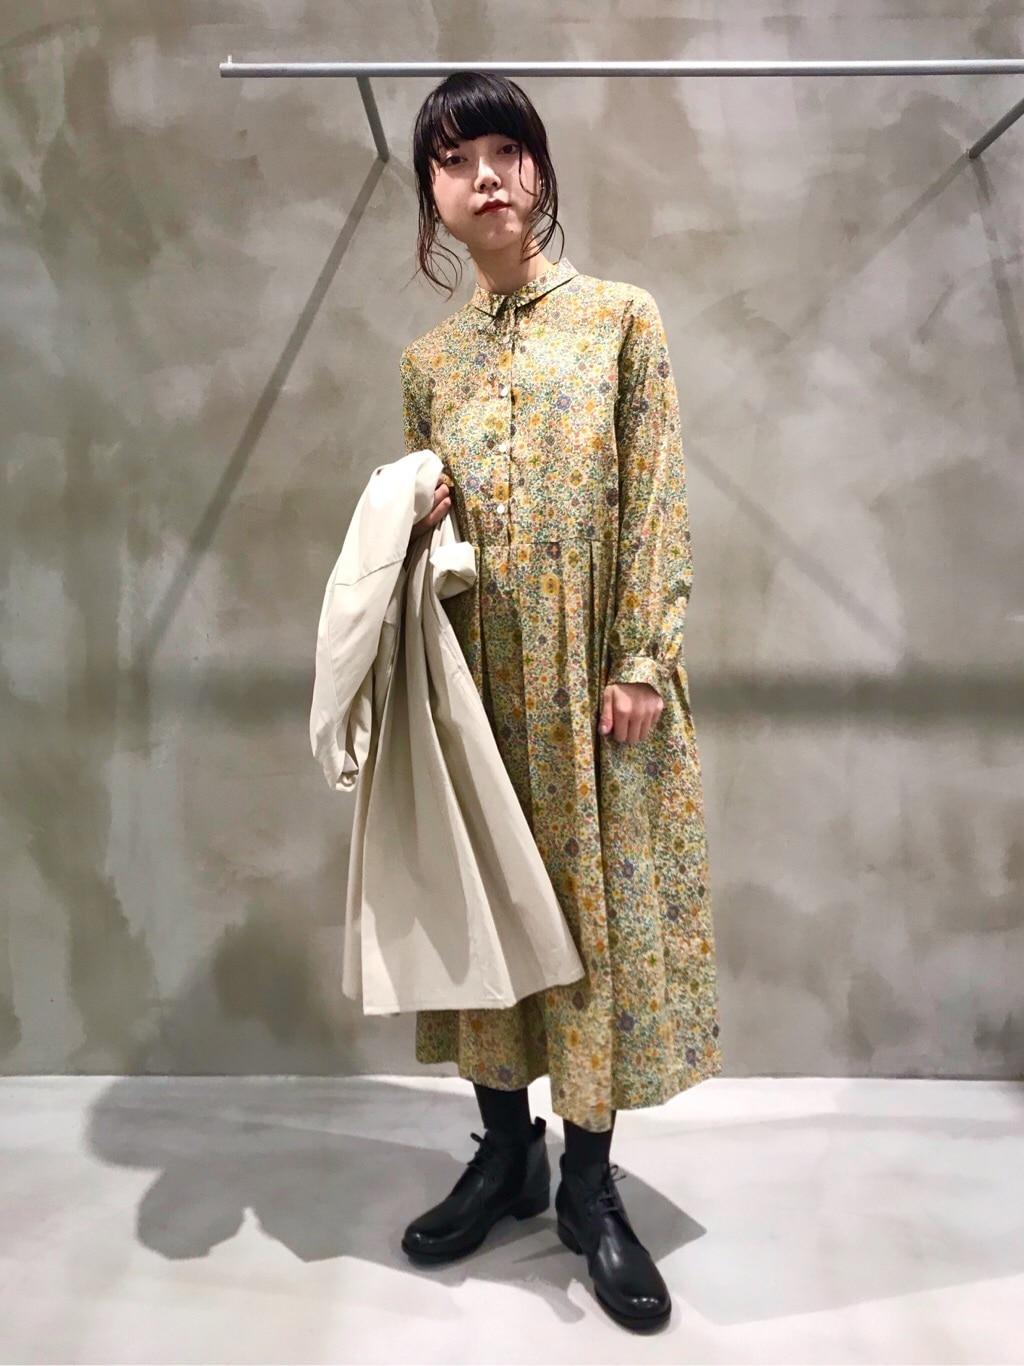 bulle de savon 渋谷スクランブルスクエア 身長:153cm 2020.02.18